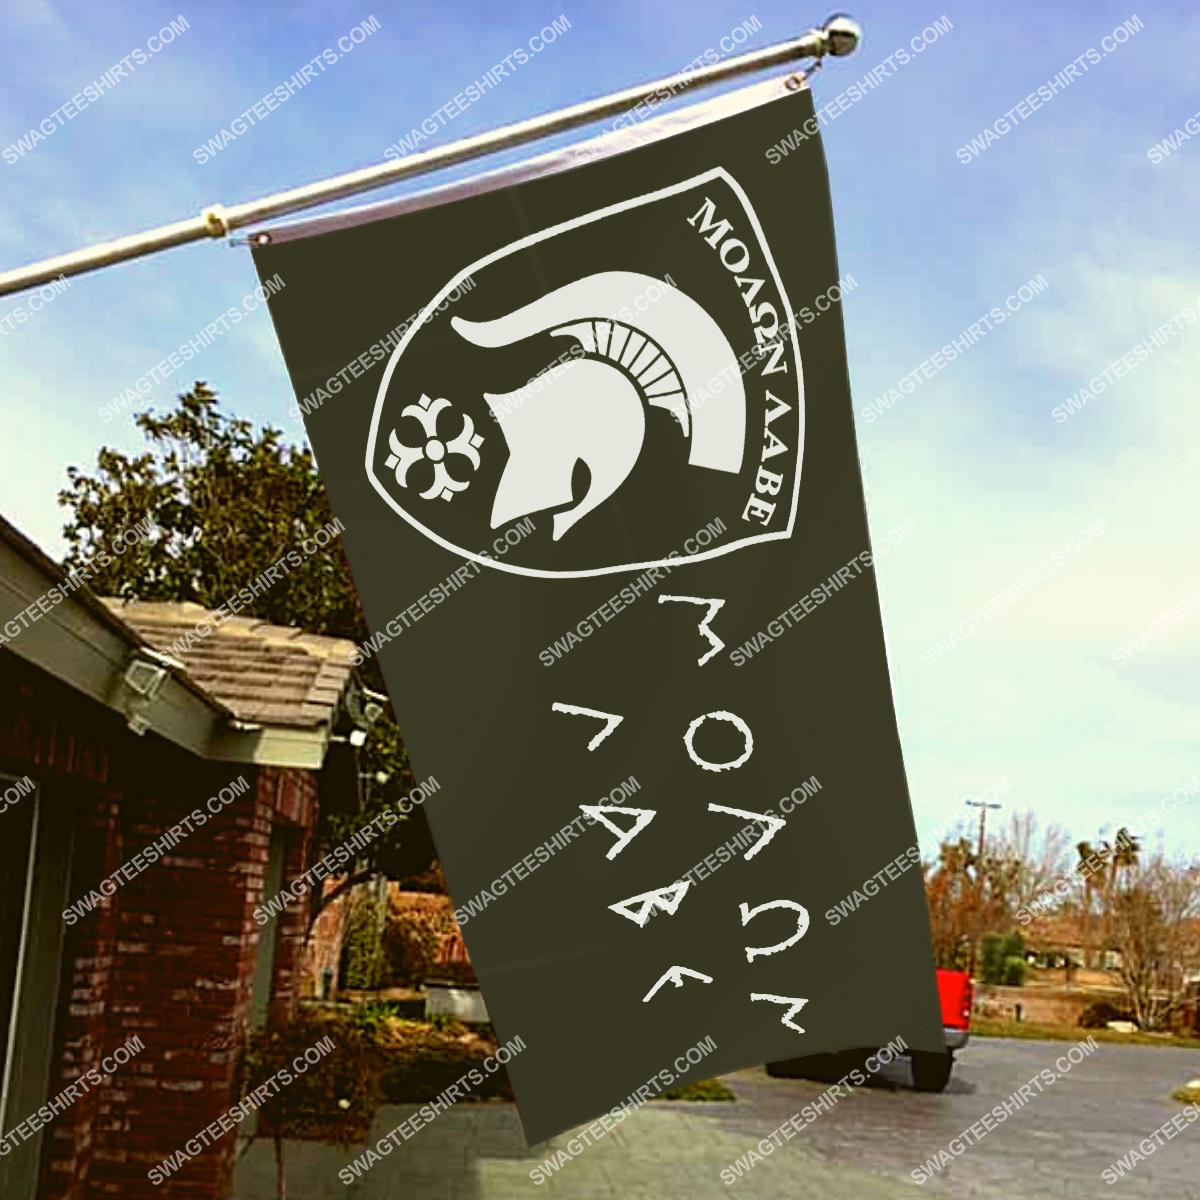 vintage molon labe spartan flag 4(1)